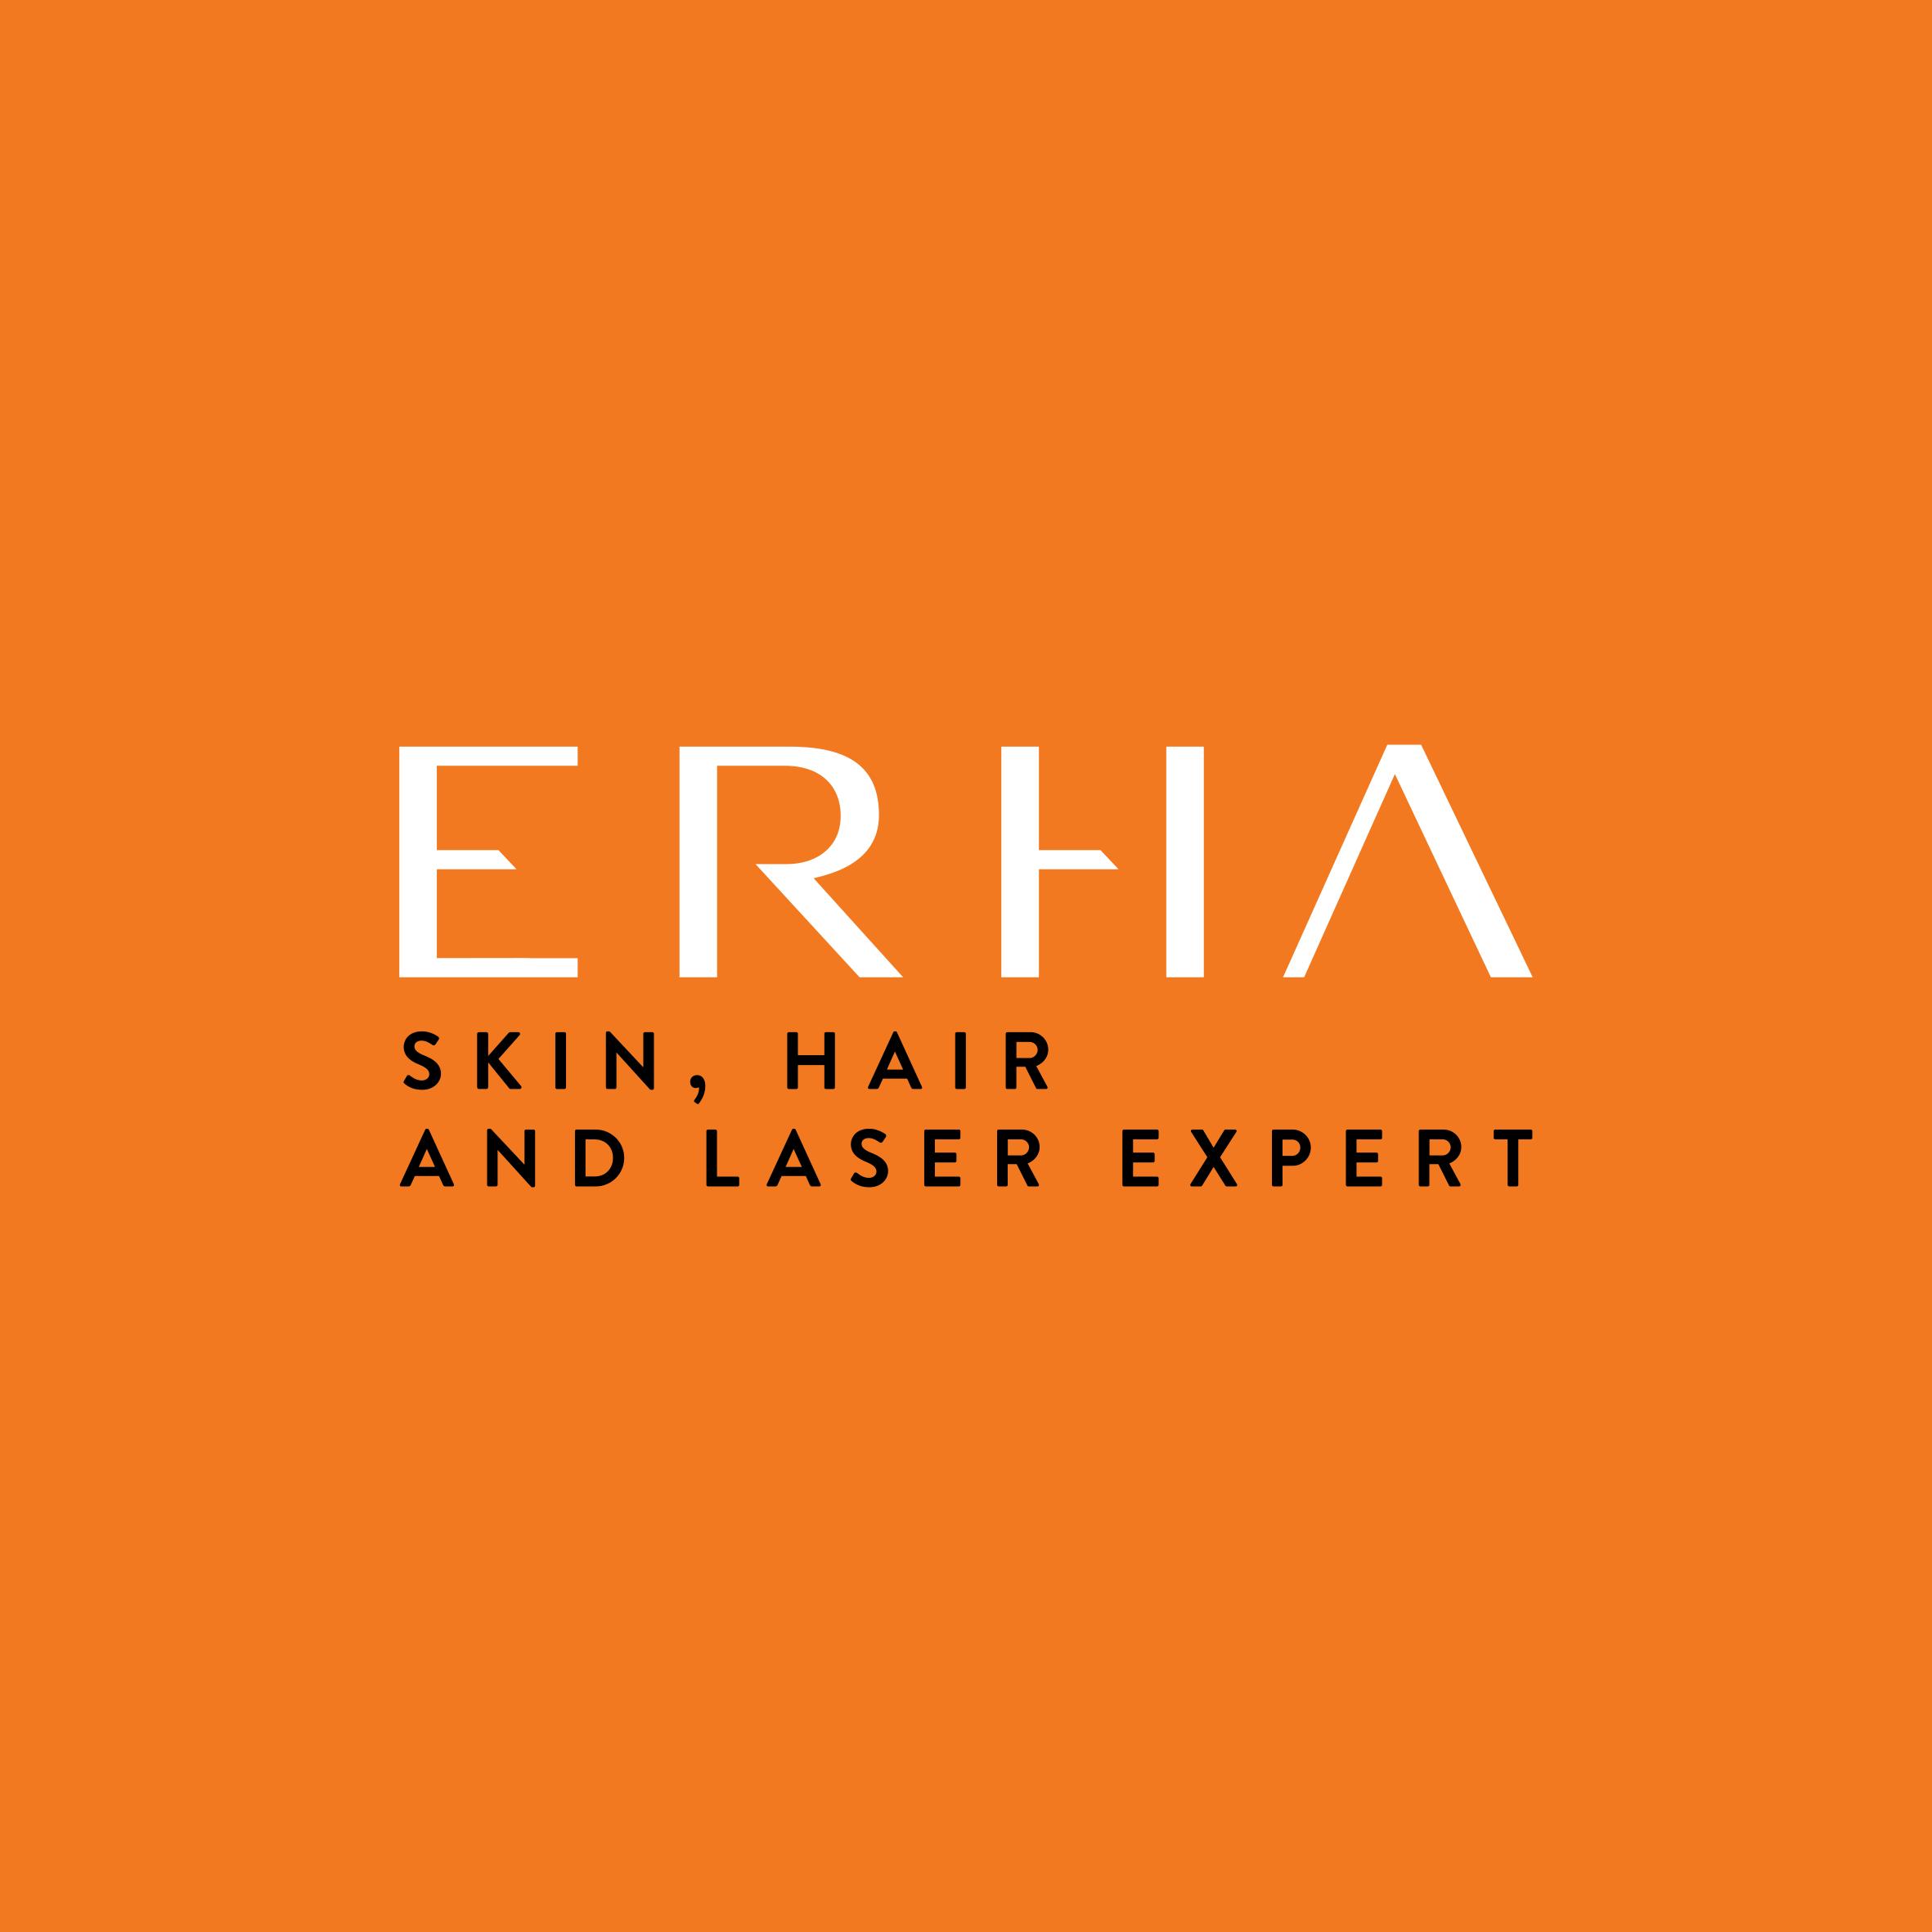 ERHA Skin, Hair & Laser Expert